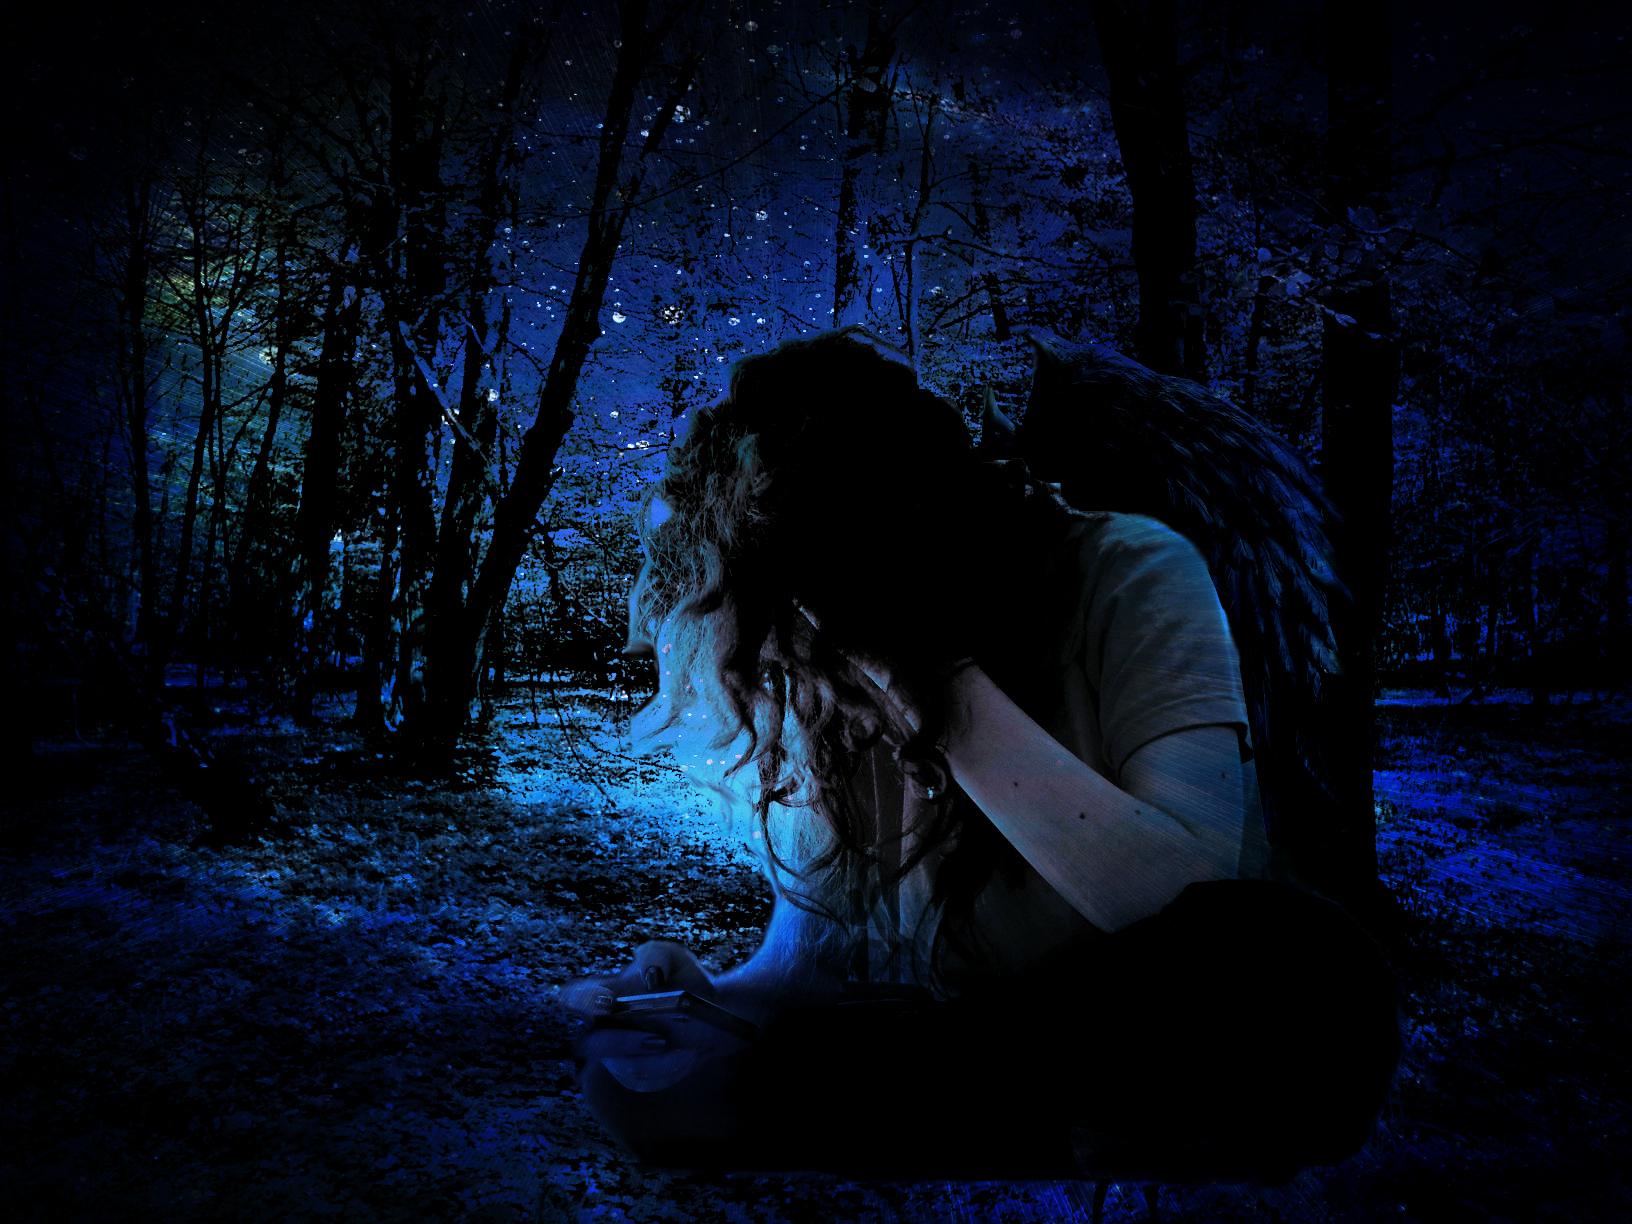 Http Nicorleeah Deviantart Com Art Dark Angel 252495079